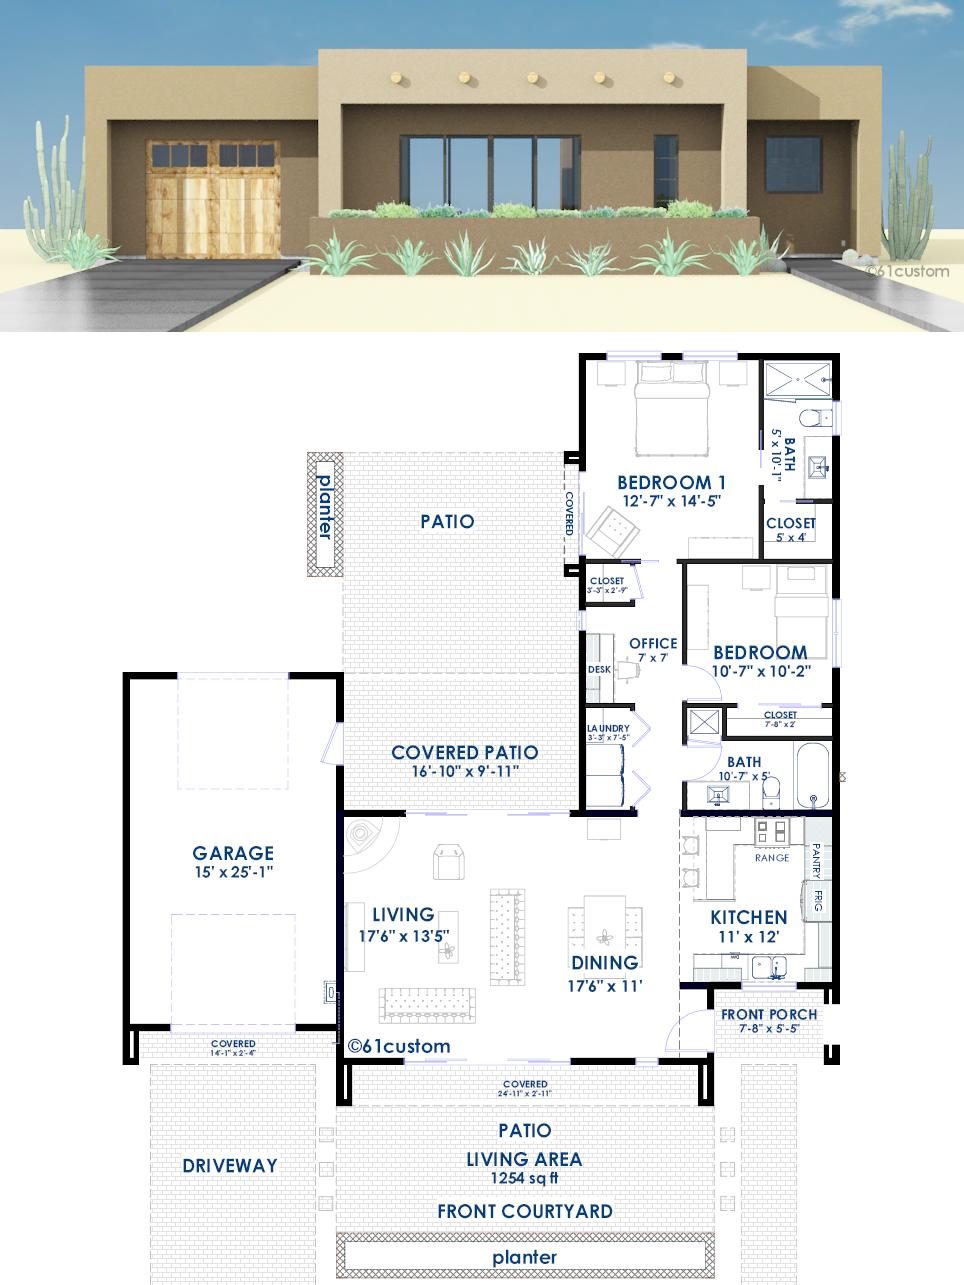 casita plans u2014 backyard casitas llc granny flats in austin texas